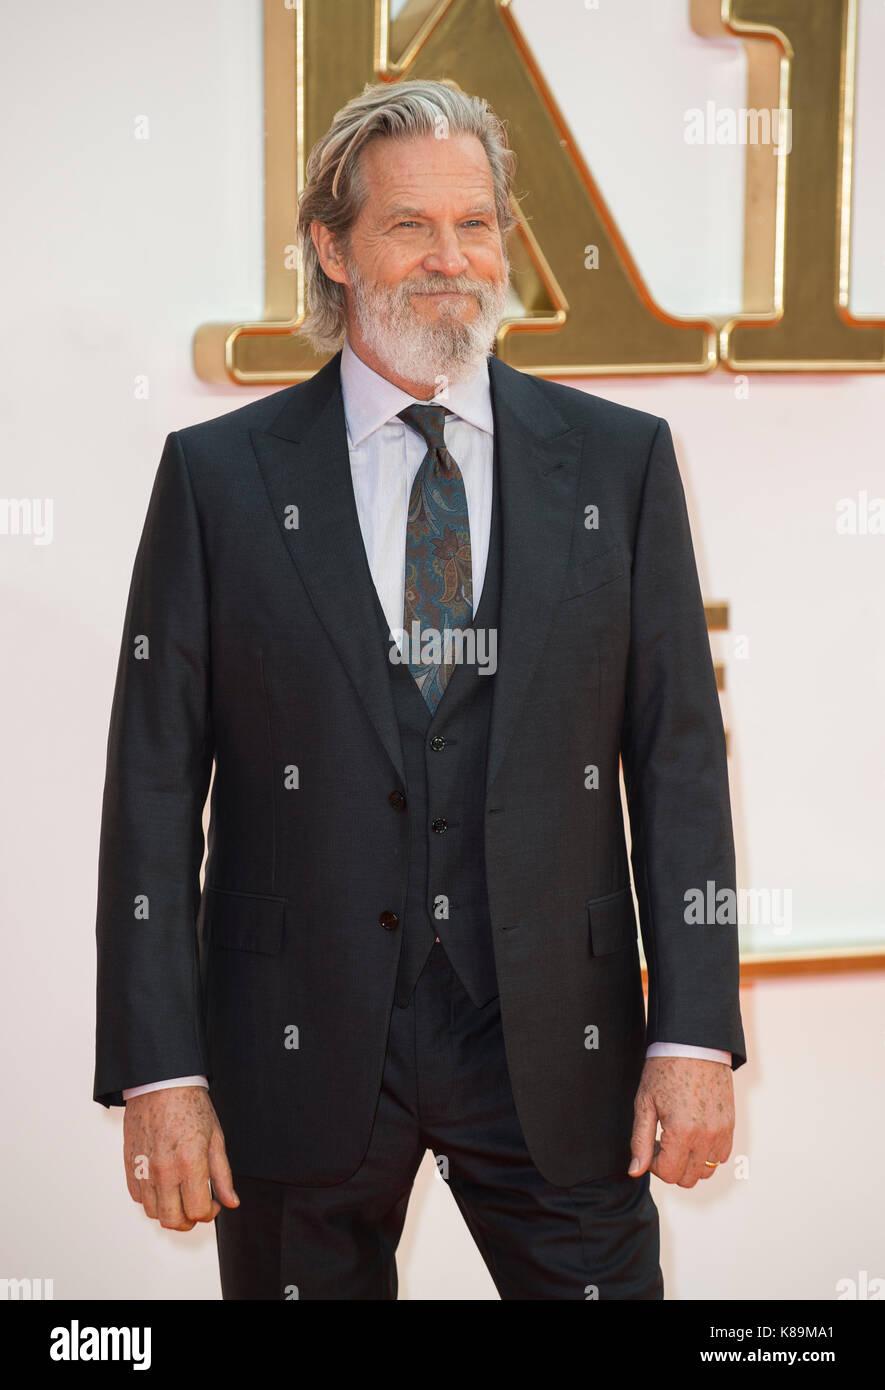 'Kingsman: The Golden Circle' World Premiere - Stock Image